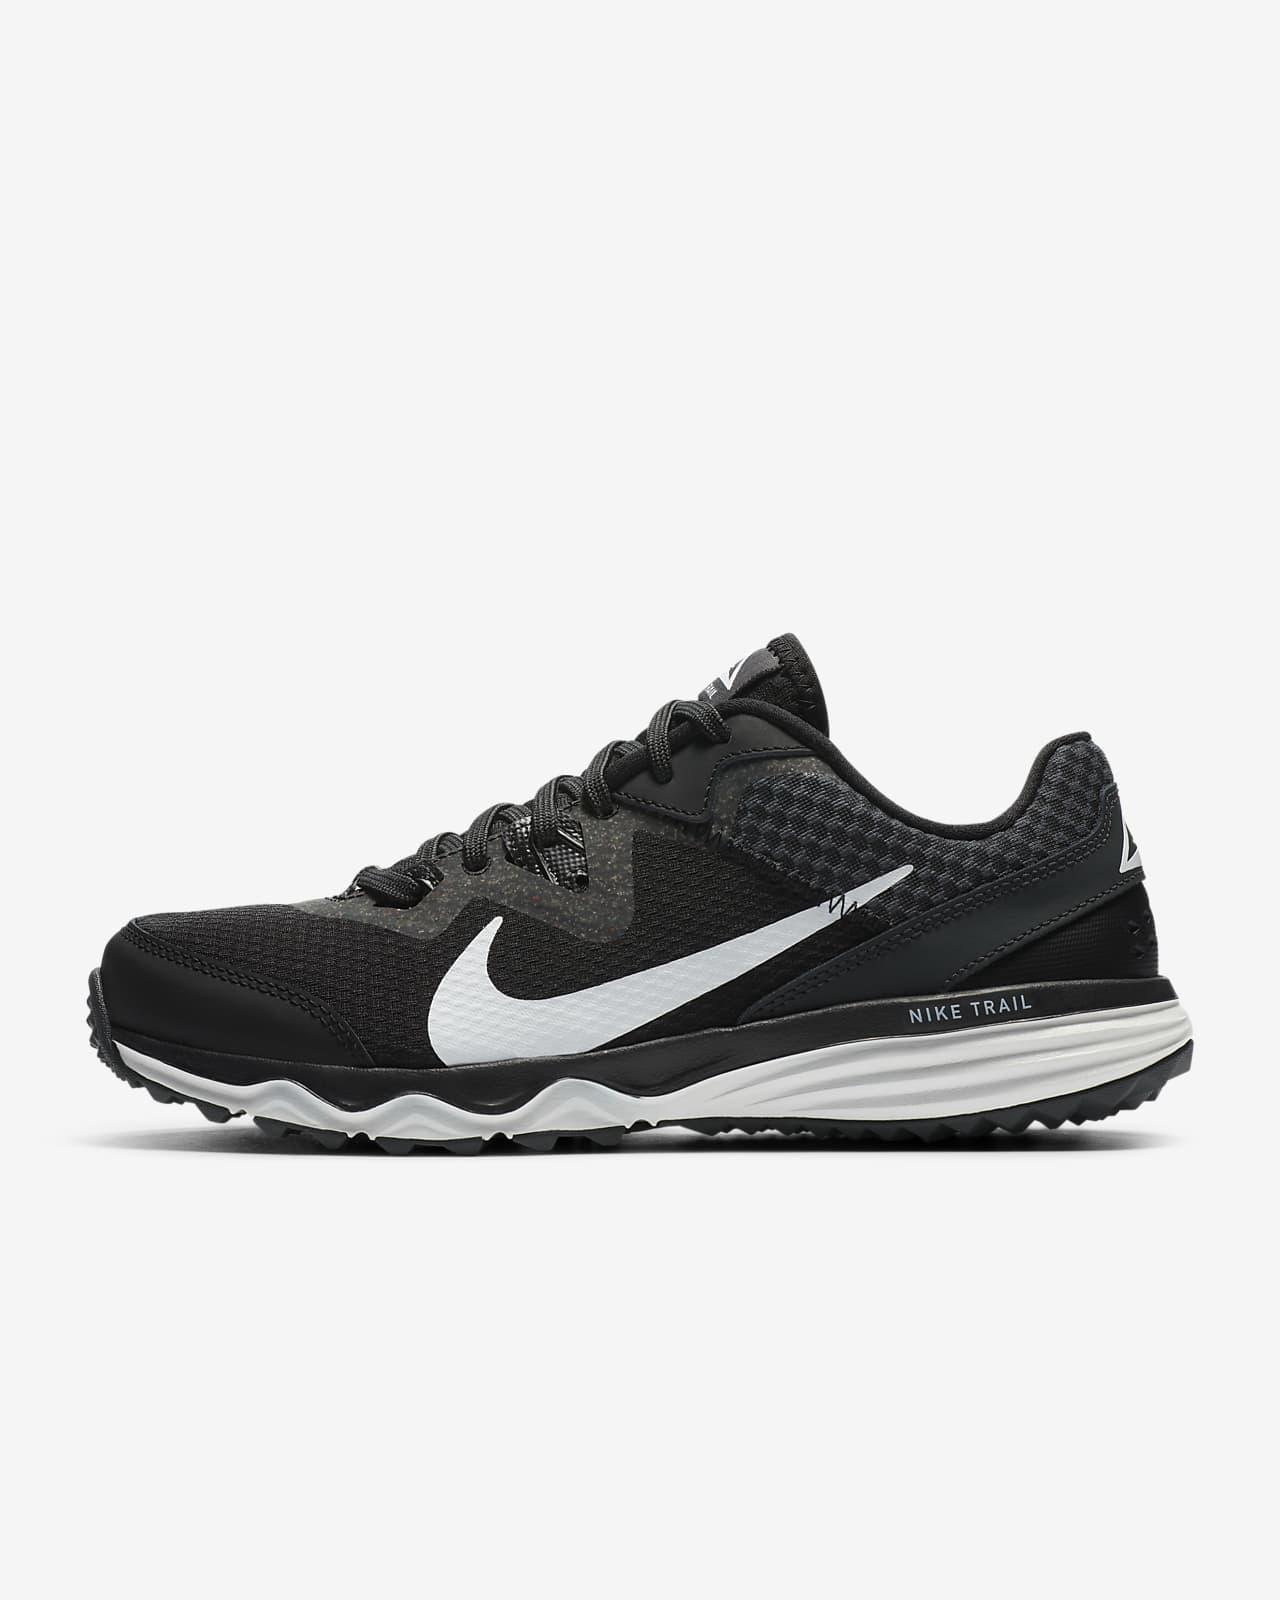 Nike Juniper Trail Women's Trail Shoe